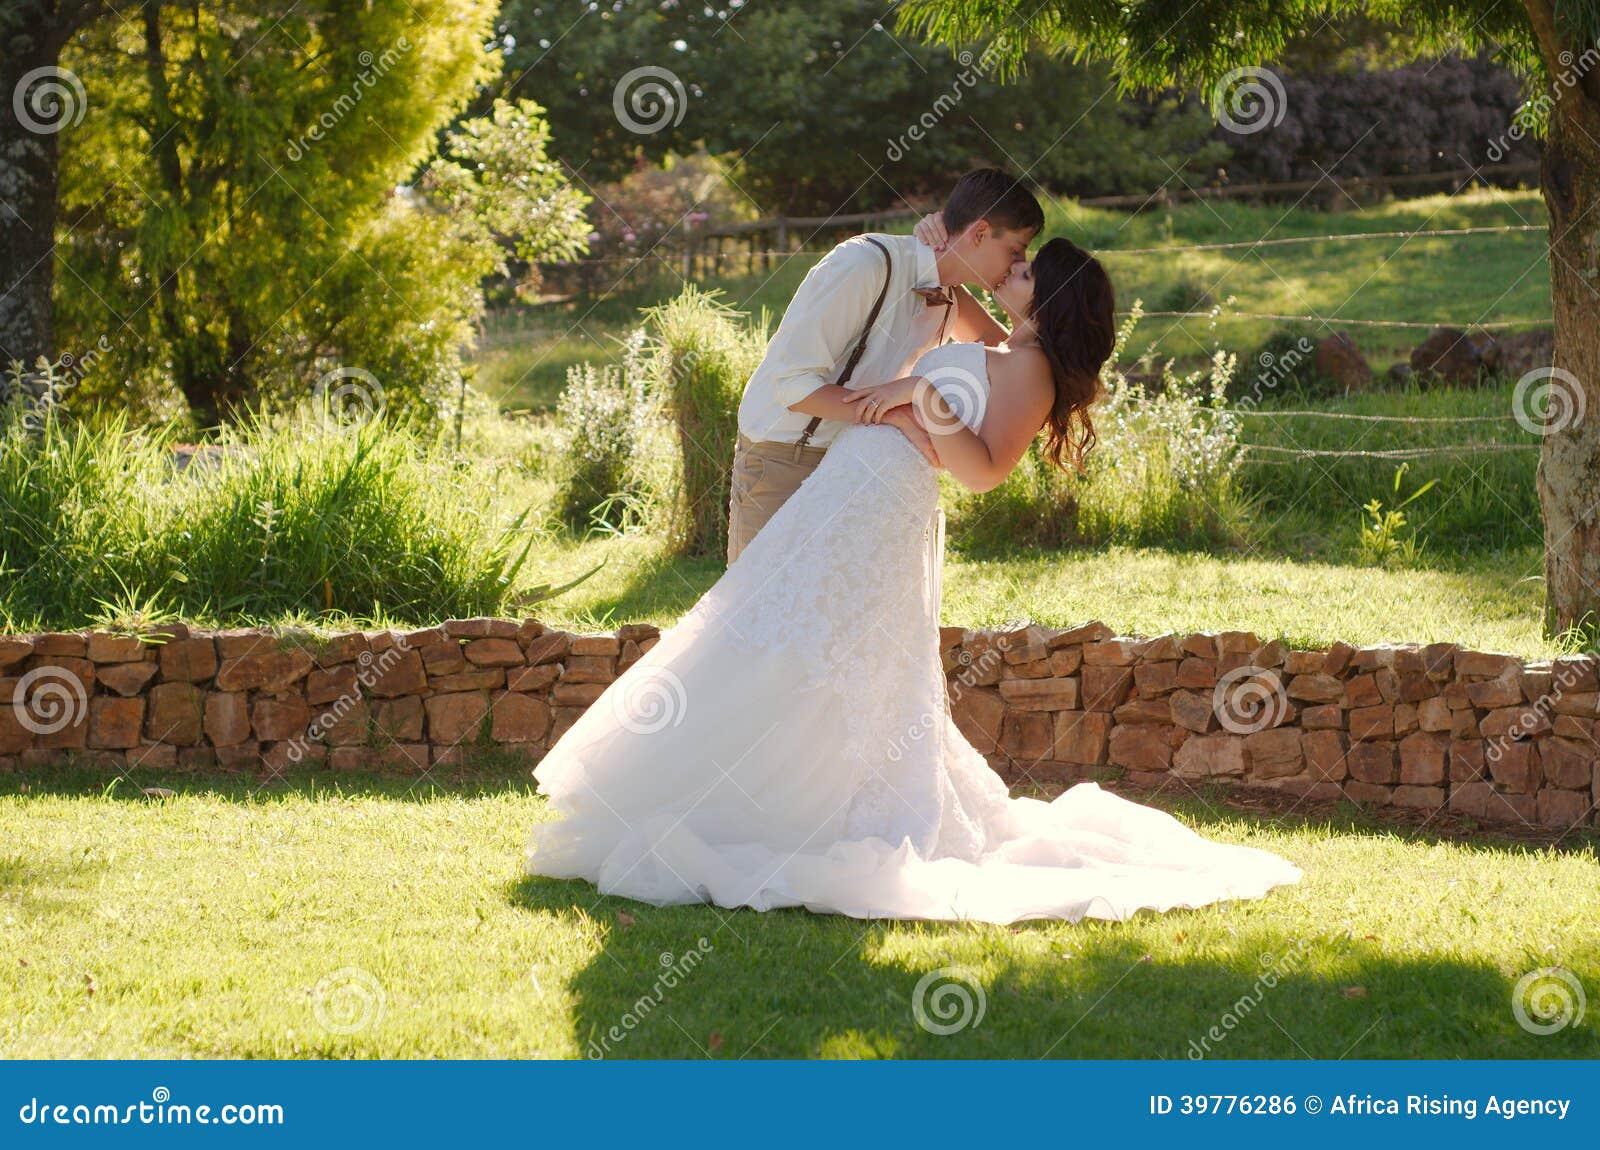 Bride and groom kissing in garden wedding